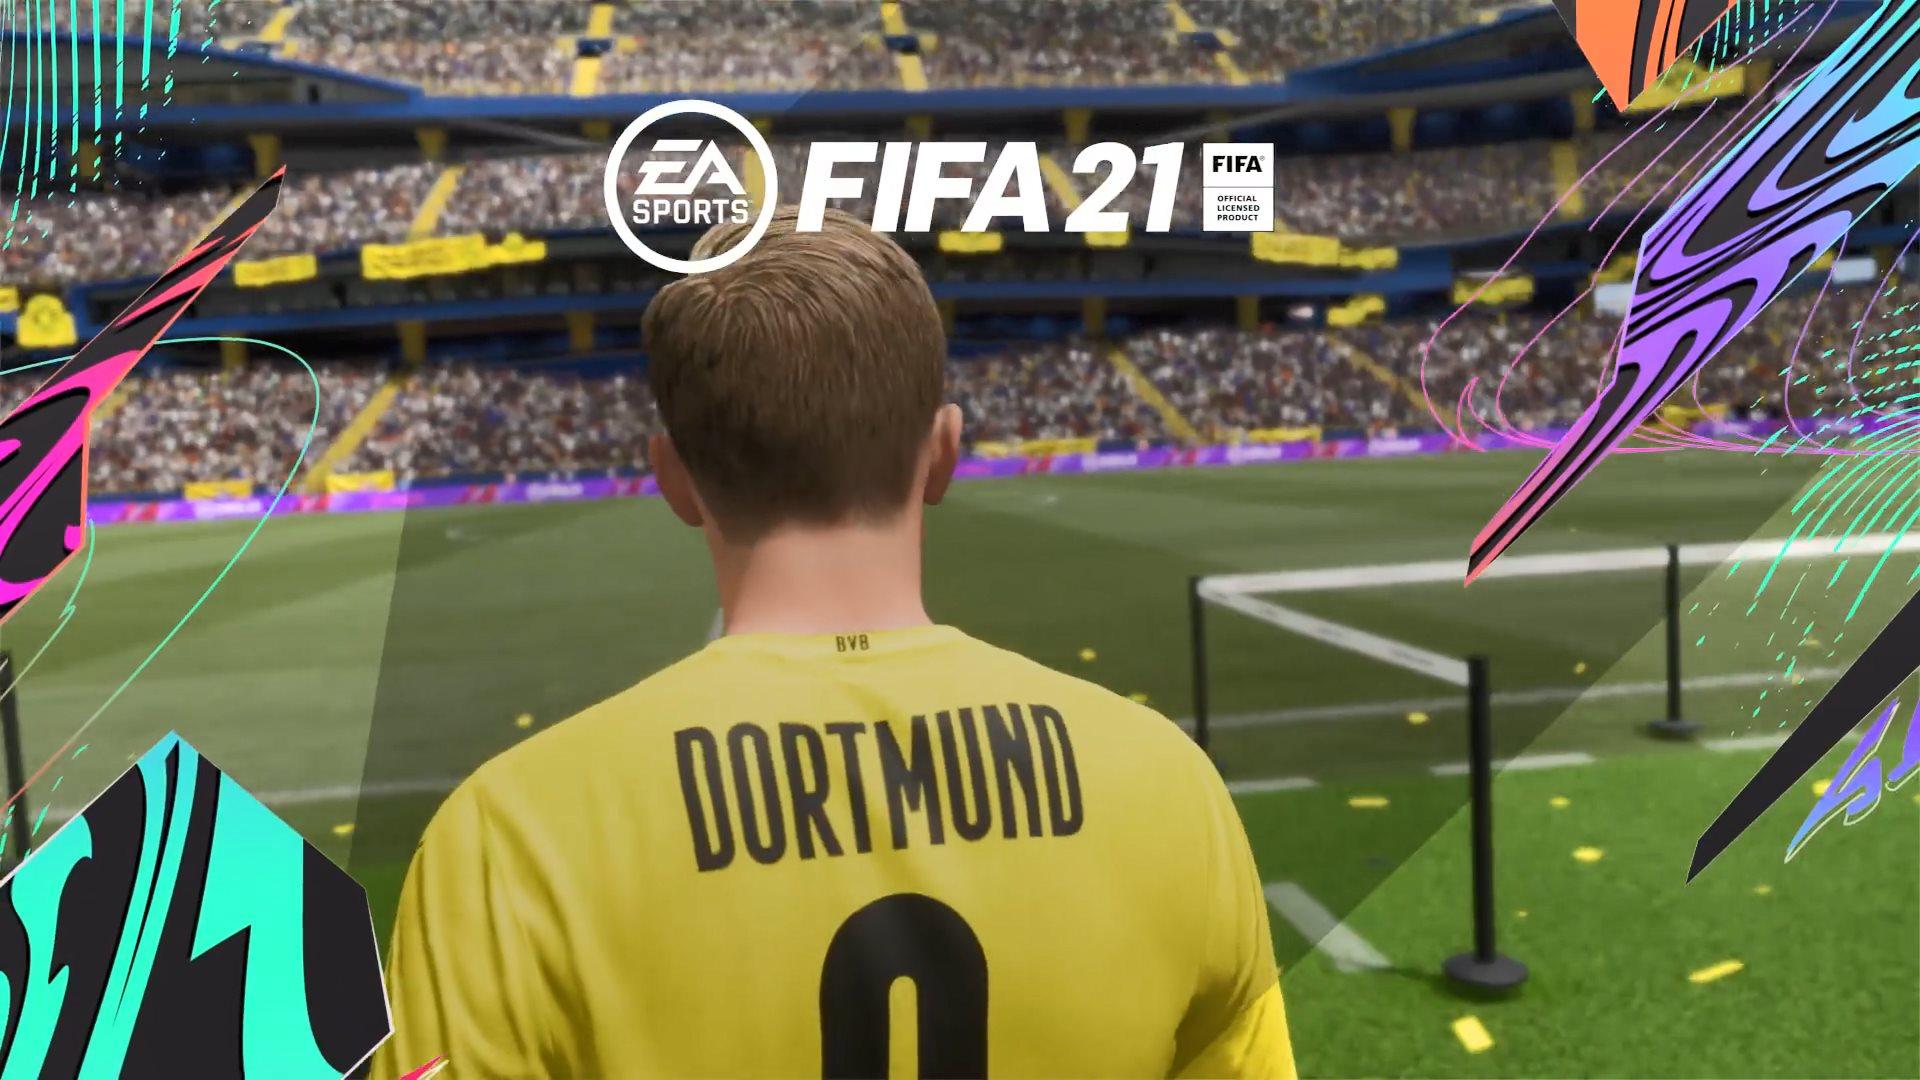 《FIFA 21》确认加入中文解说评述 首段预告释出